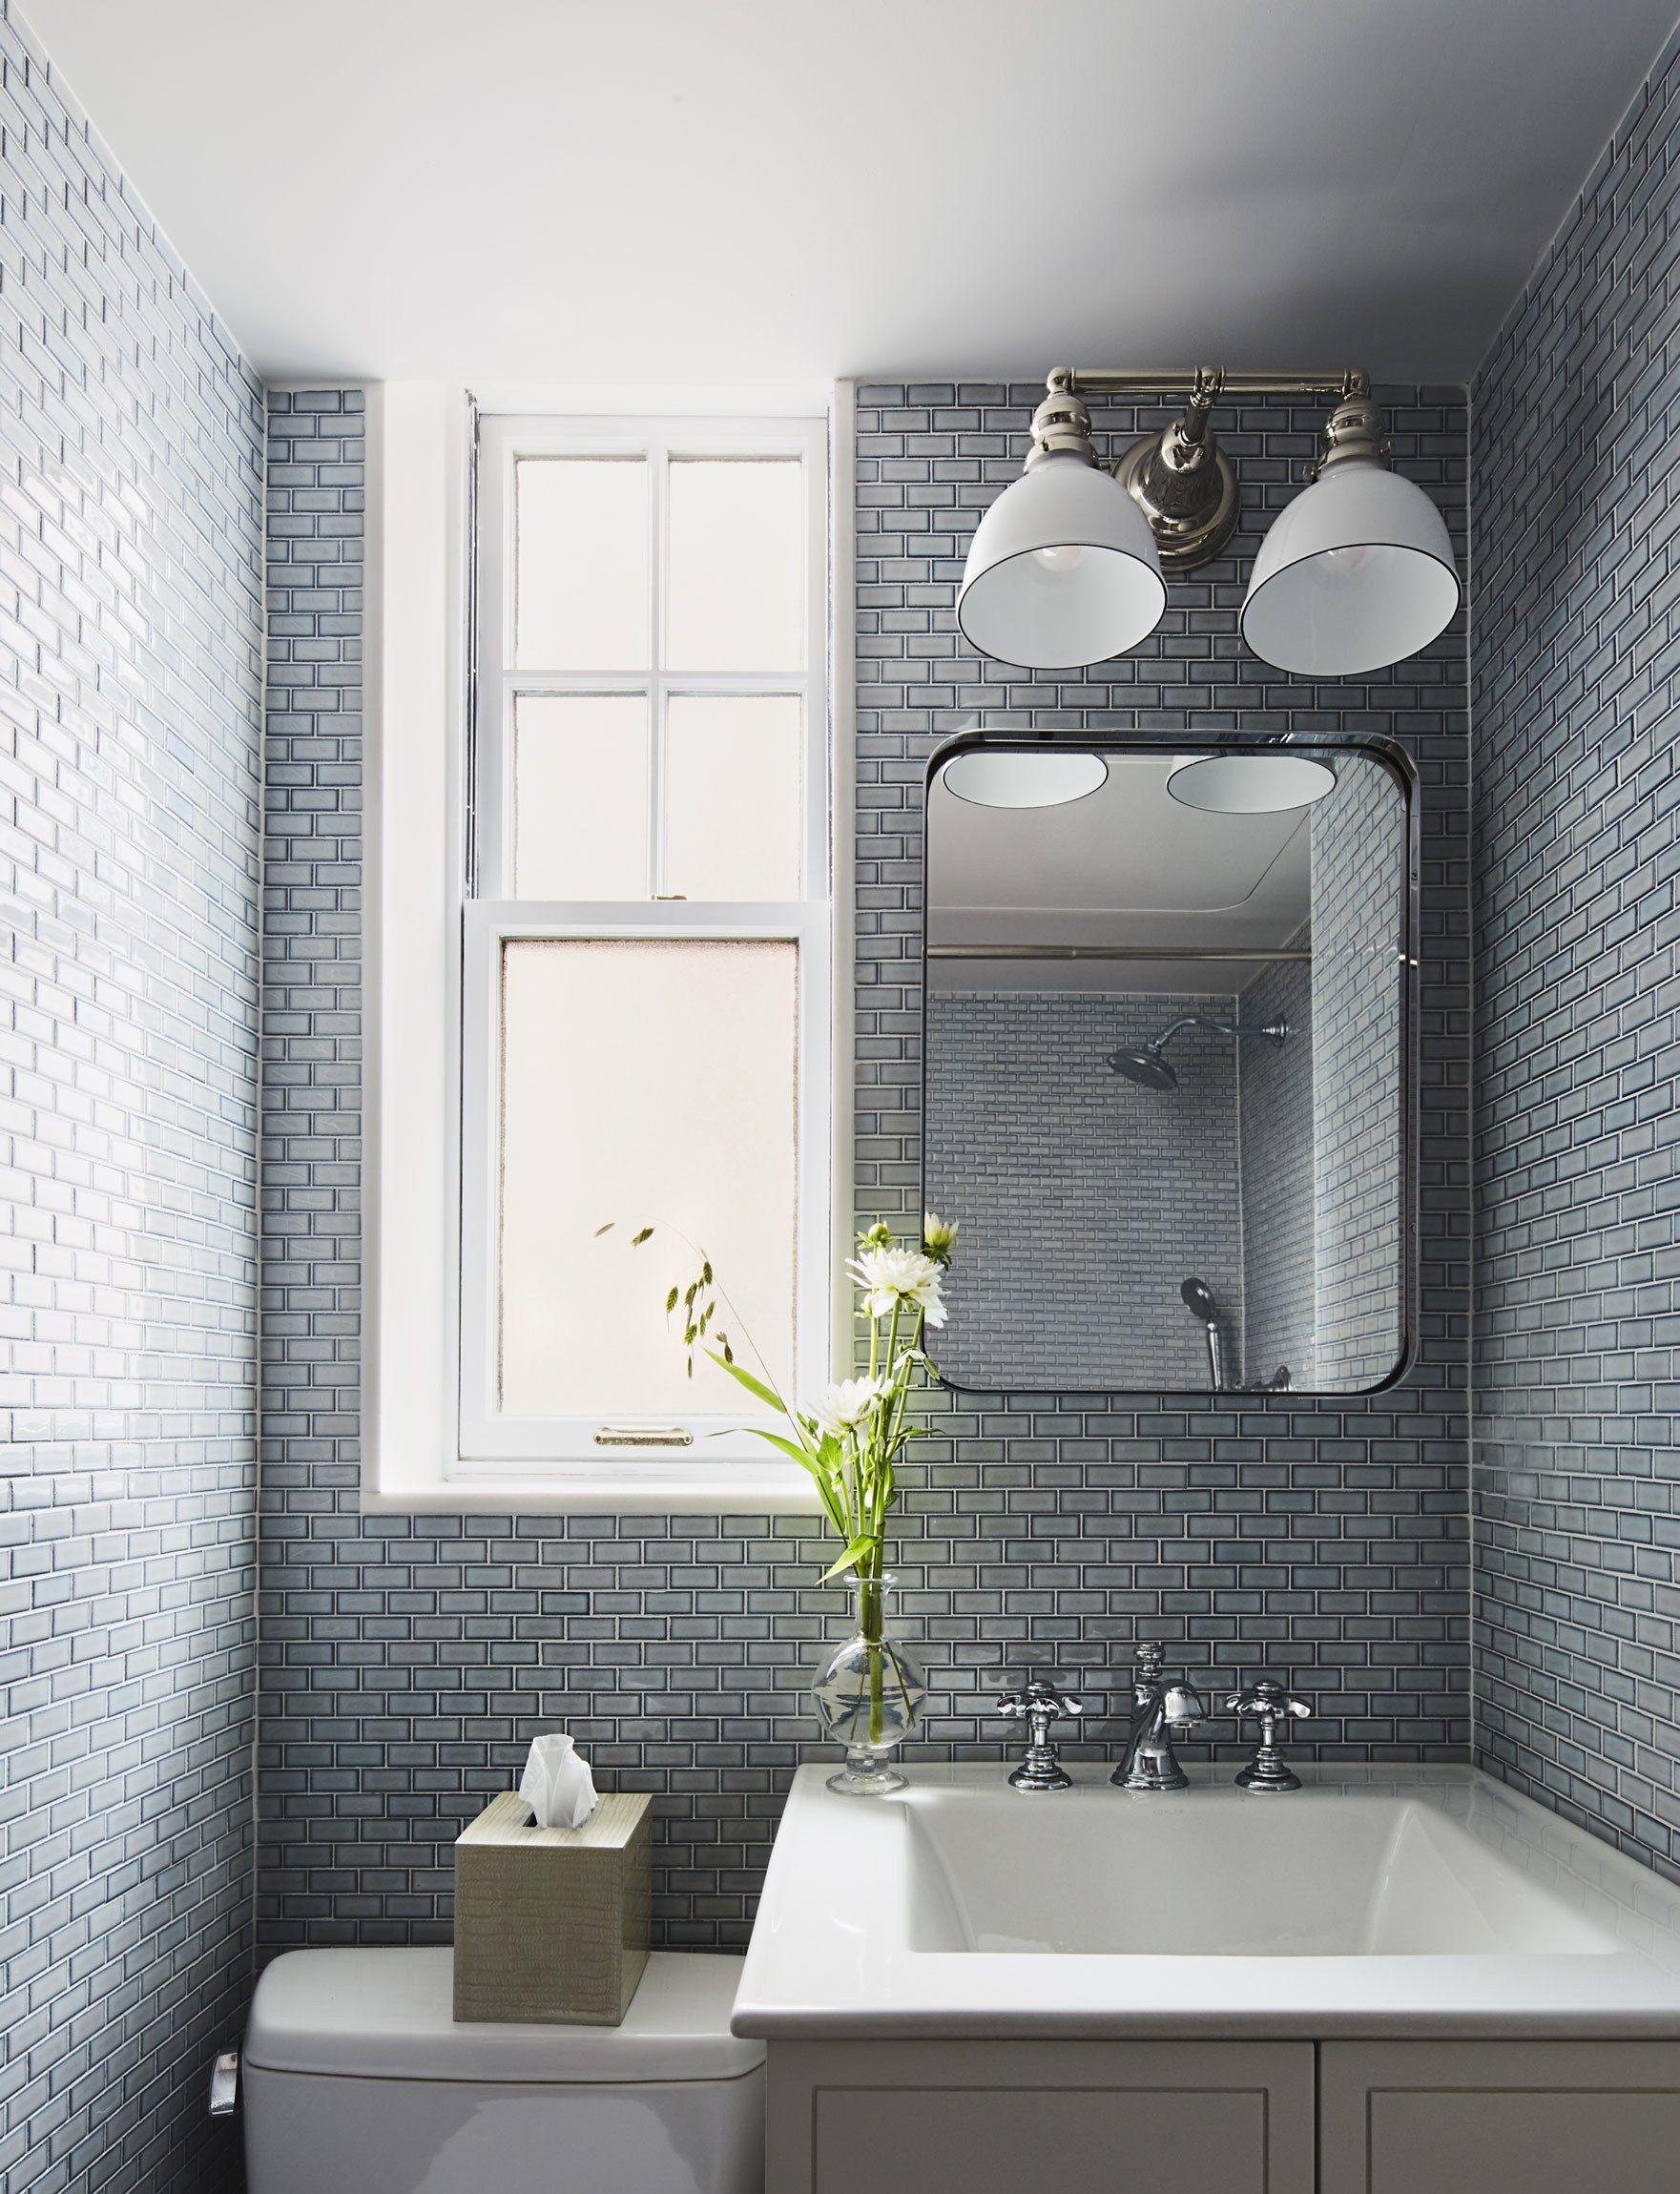 A Midcentury Inspired Apartment With Scandinavian Tendencies White Bathroom Tiles Bathroom Design Decor Bathroom Interior